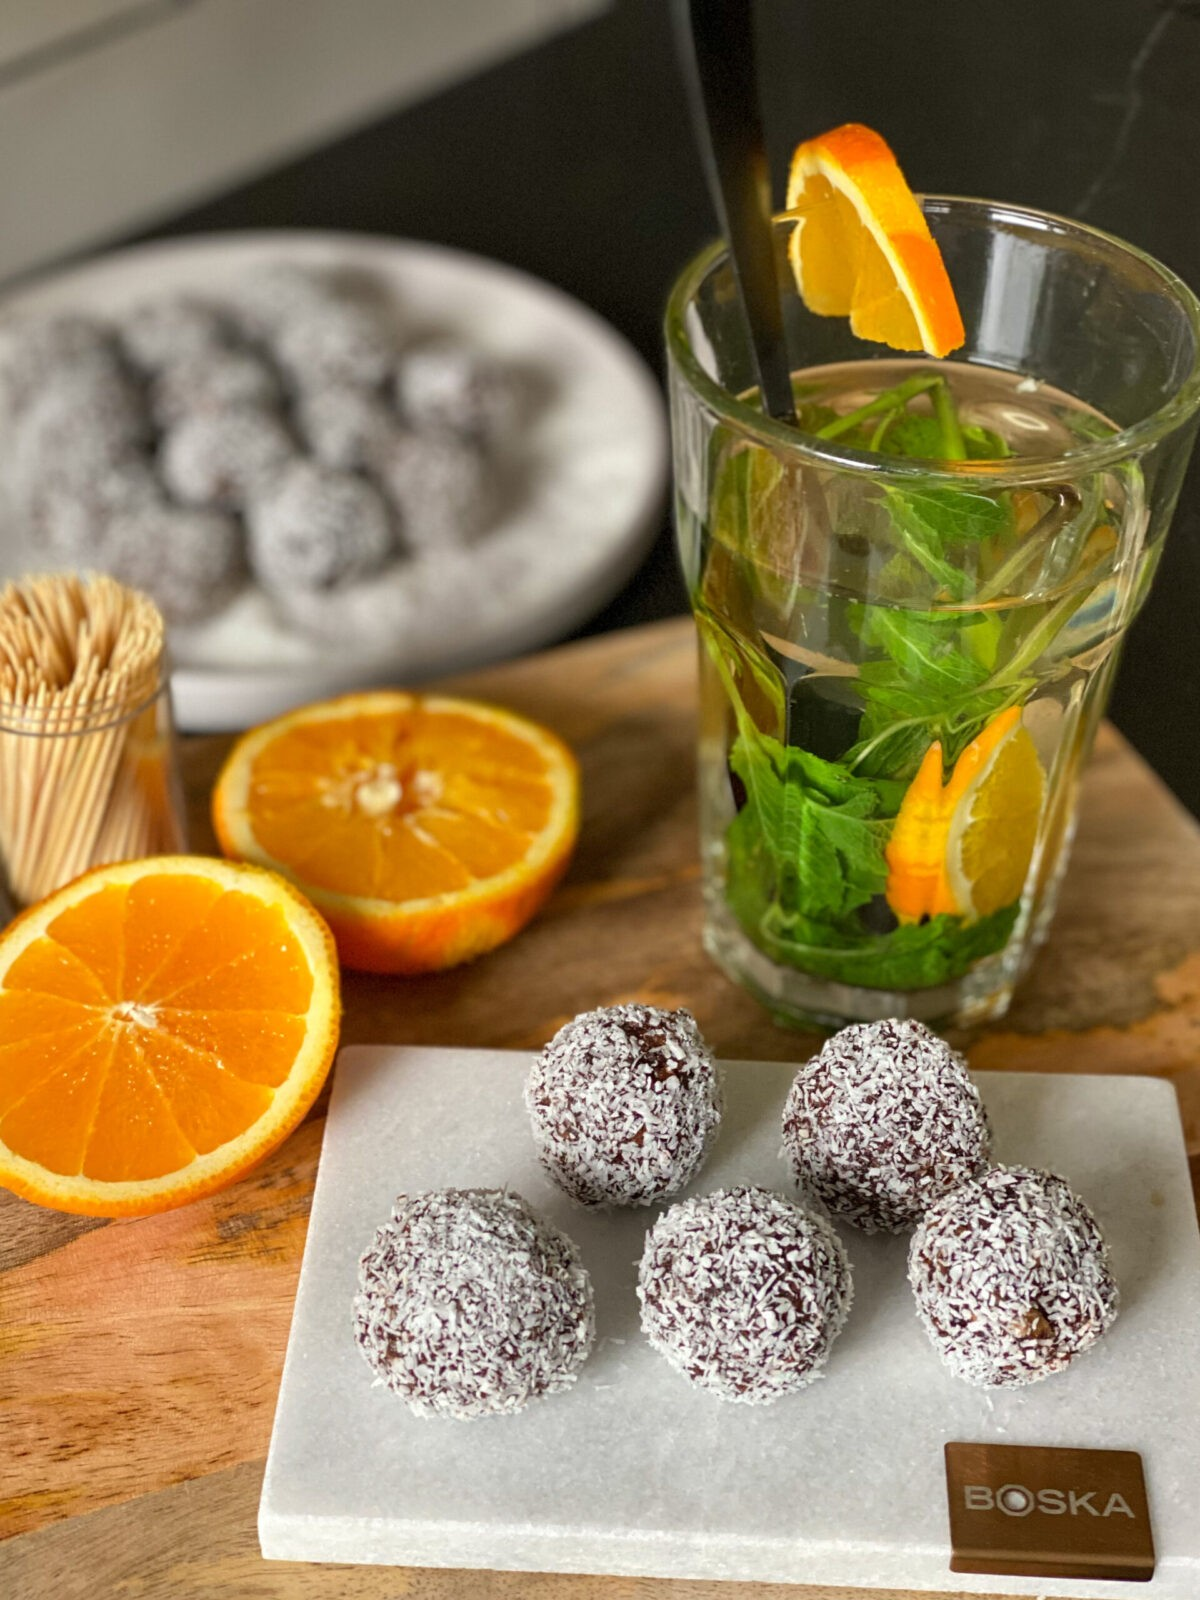 dadelballetjes met sinaasappel en geraspte kokos